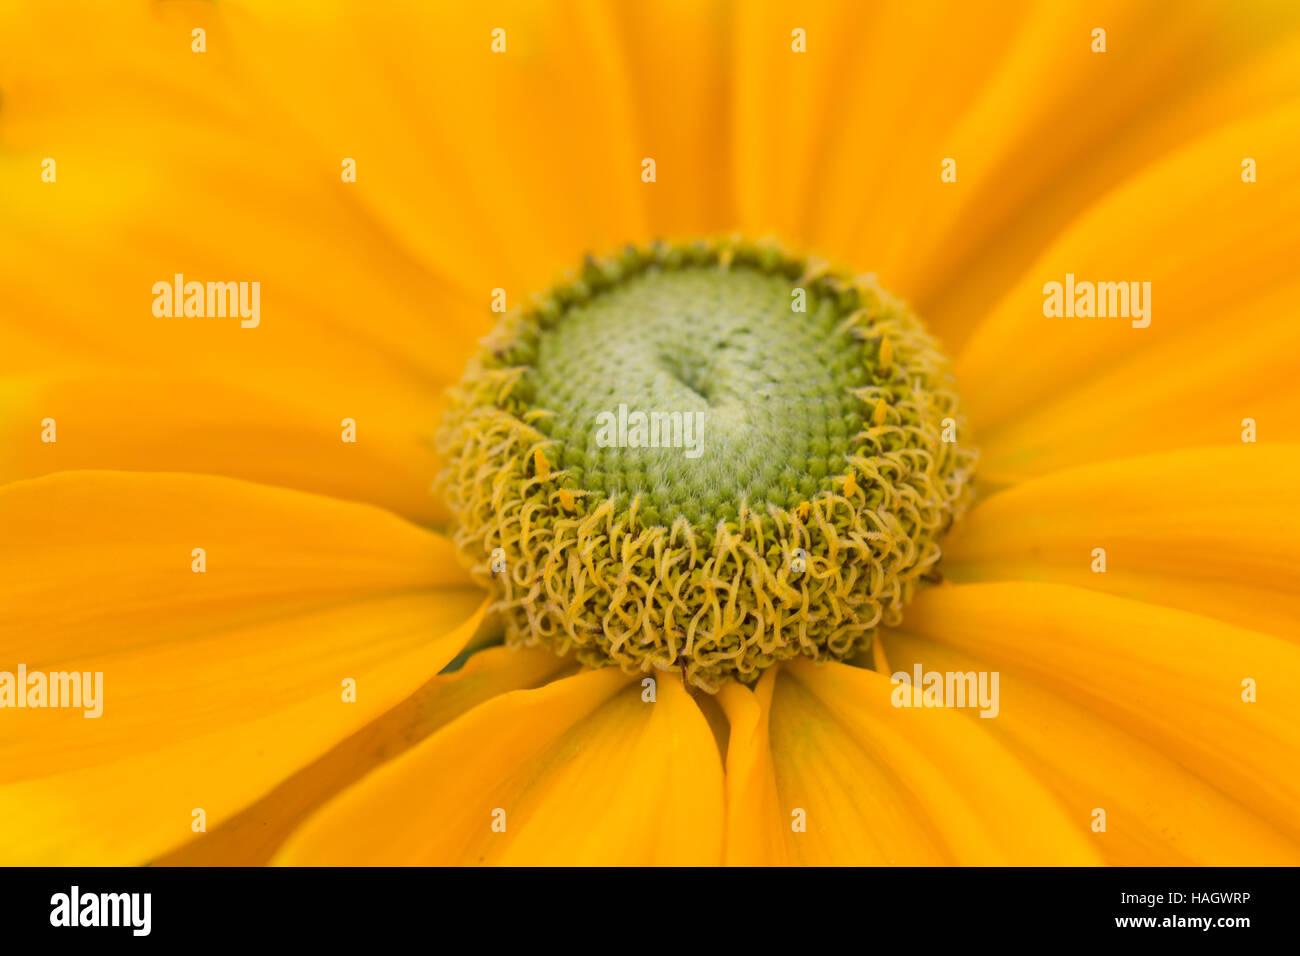 Yellow rudbeckia flower with green centre stock photo 126990634 alamy yellow rudbeckia flower with green centre mightylinksfo